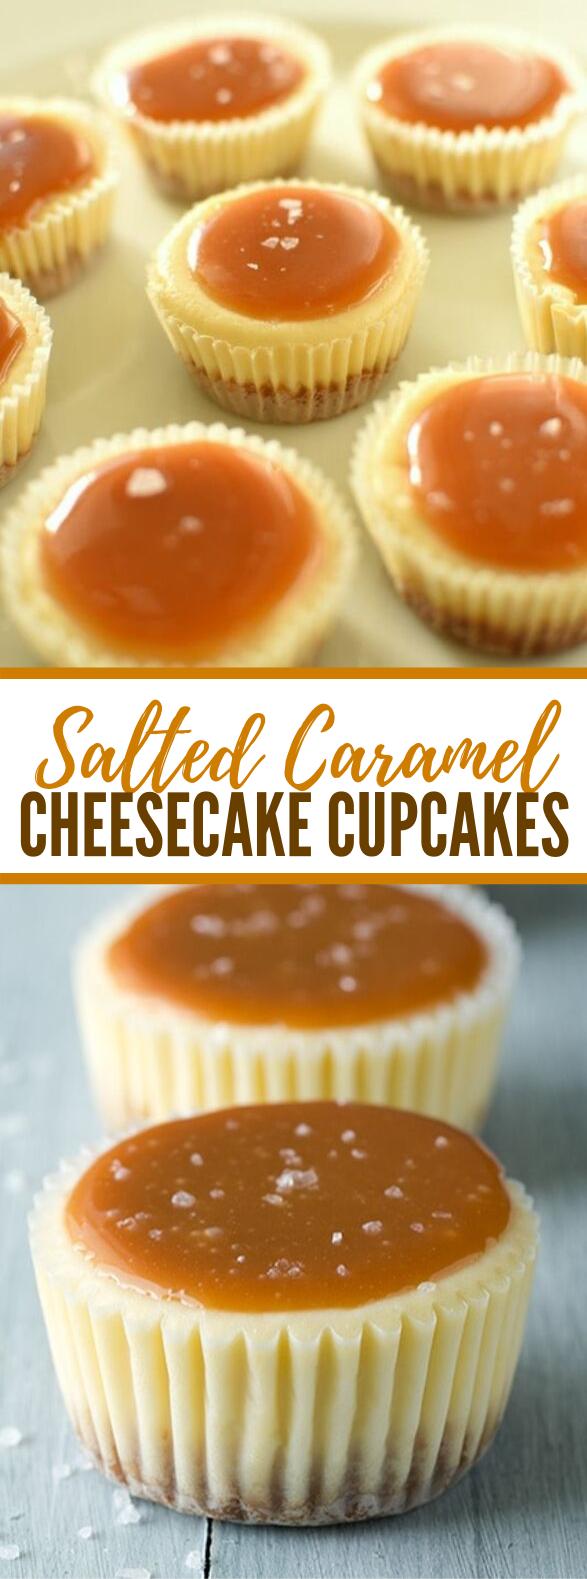 Salted Caramel Cheesecake Cupcakes #desserts #minicheesecake